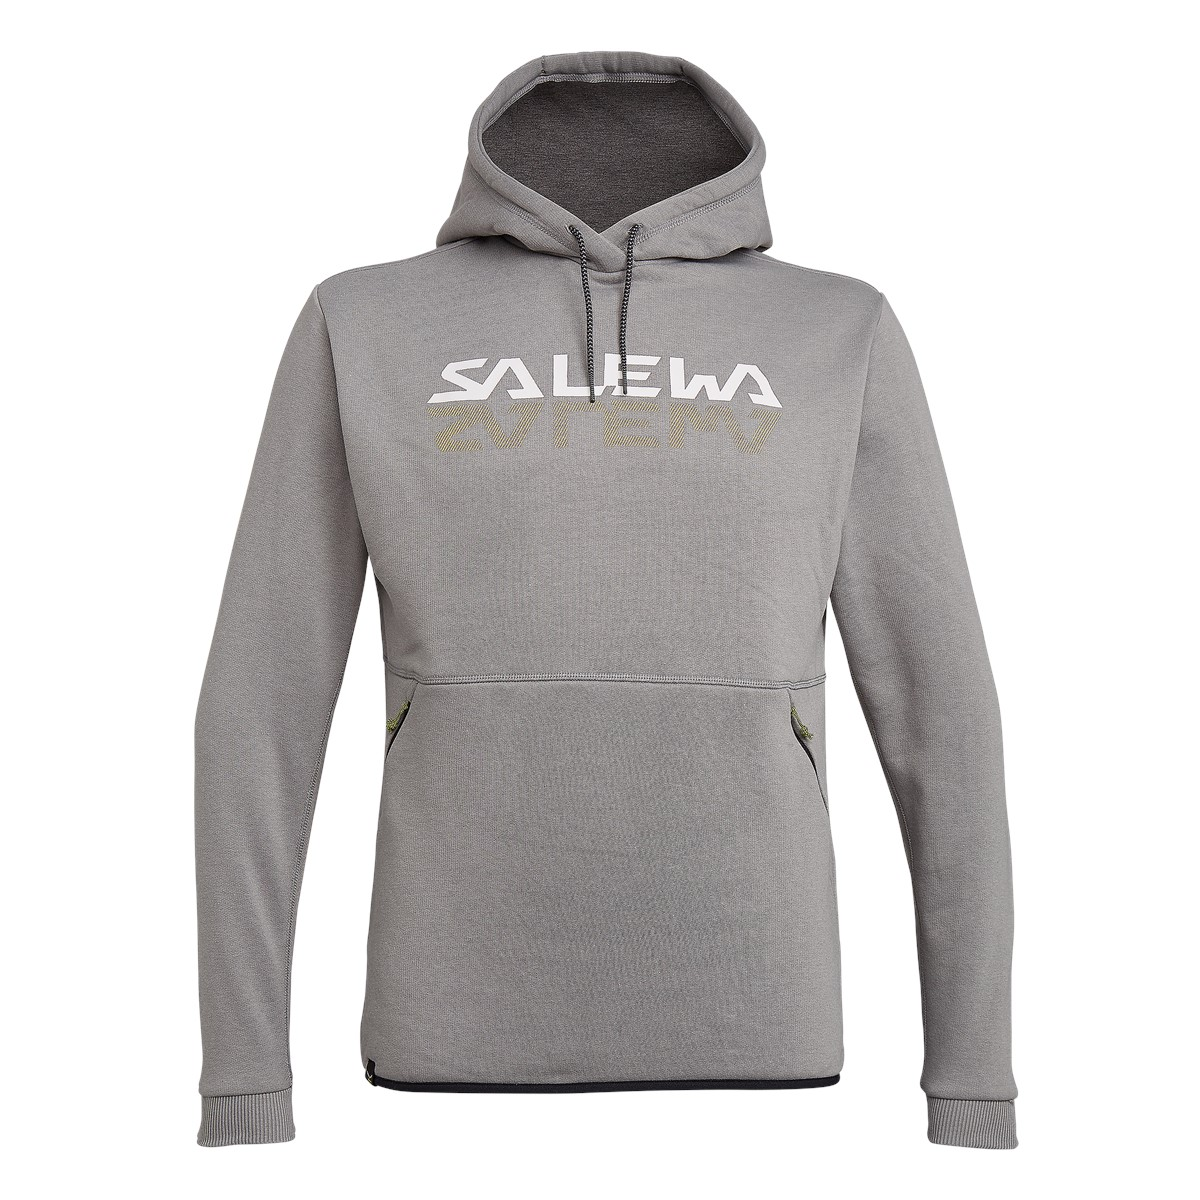 Salewa REFLECTION DRY M HDY - grey melange - 48/M